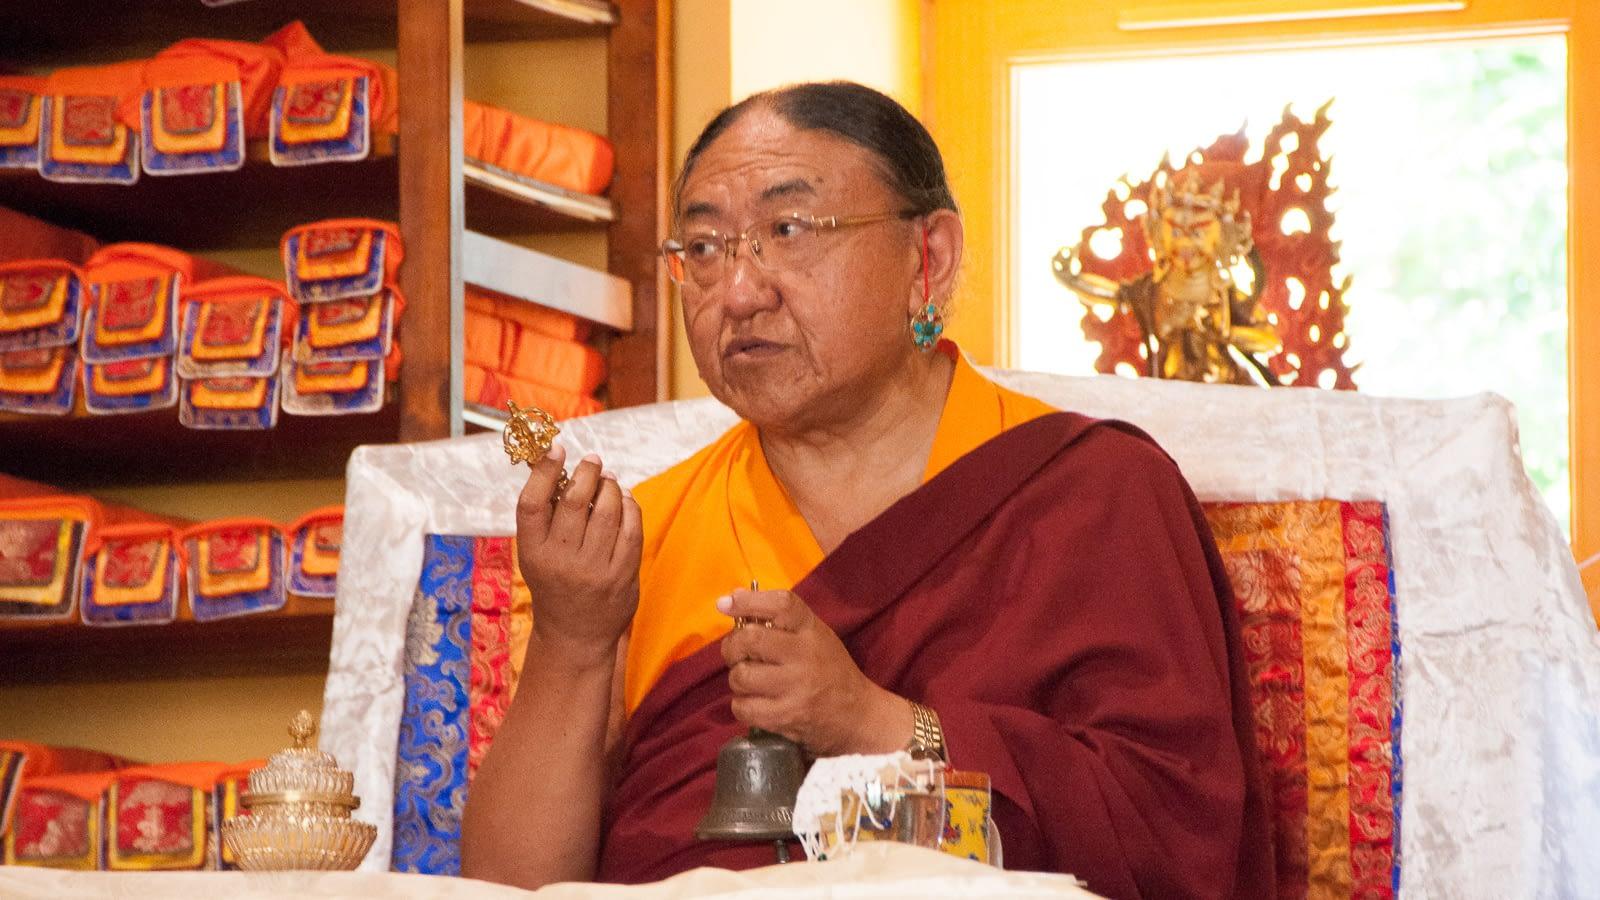 Cancelled - HH Sakya Gongma Trichen's visit